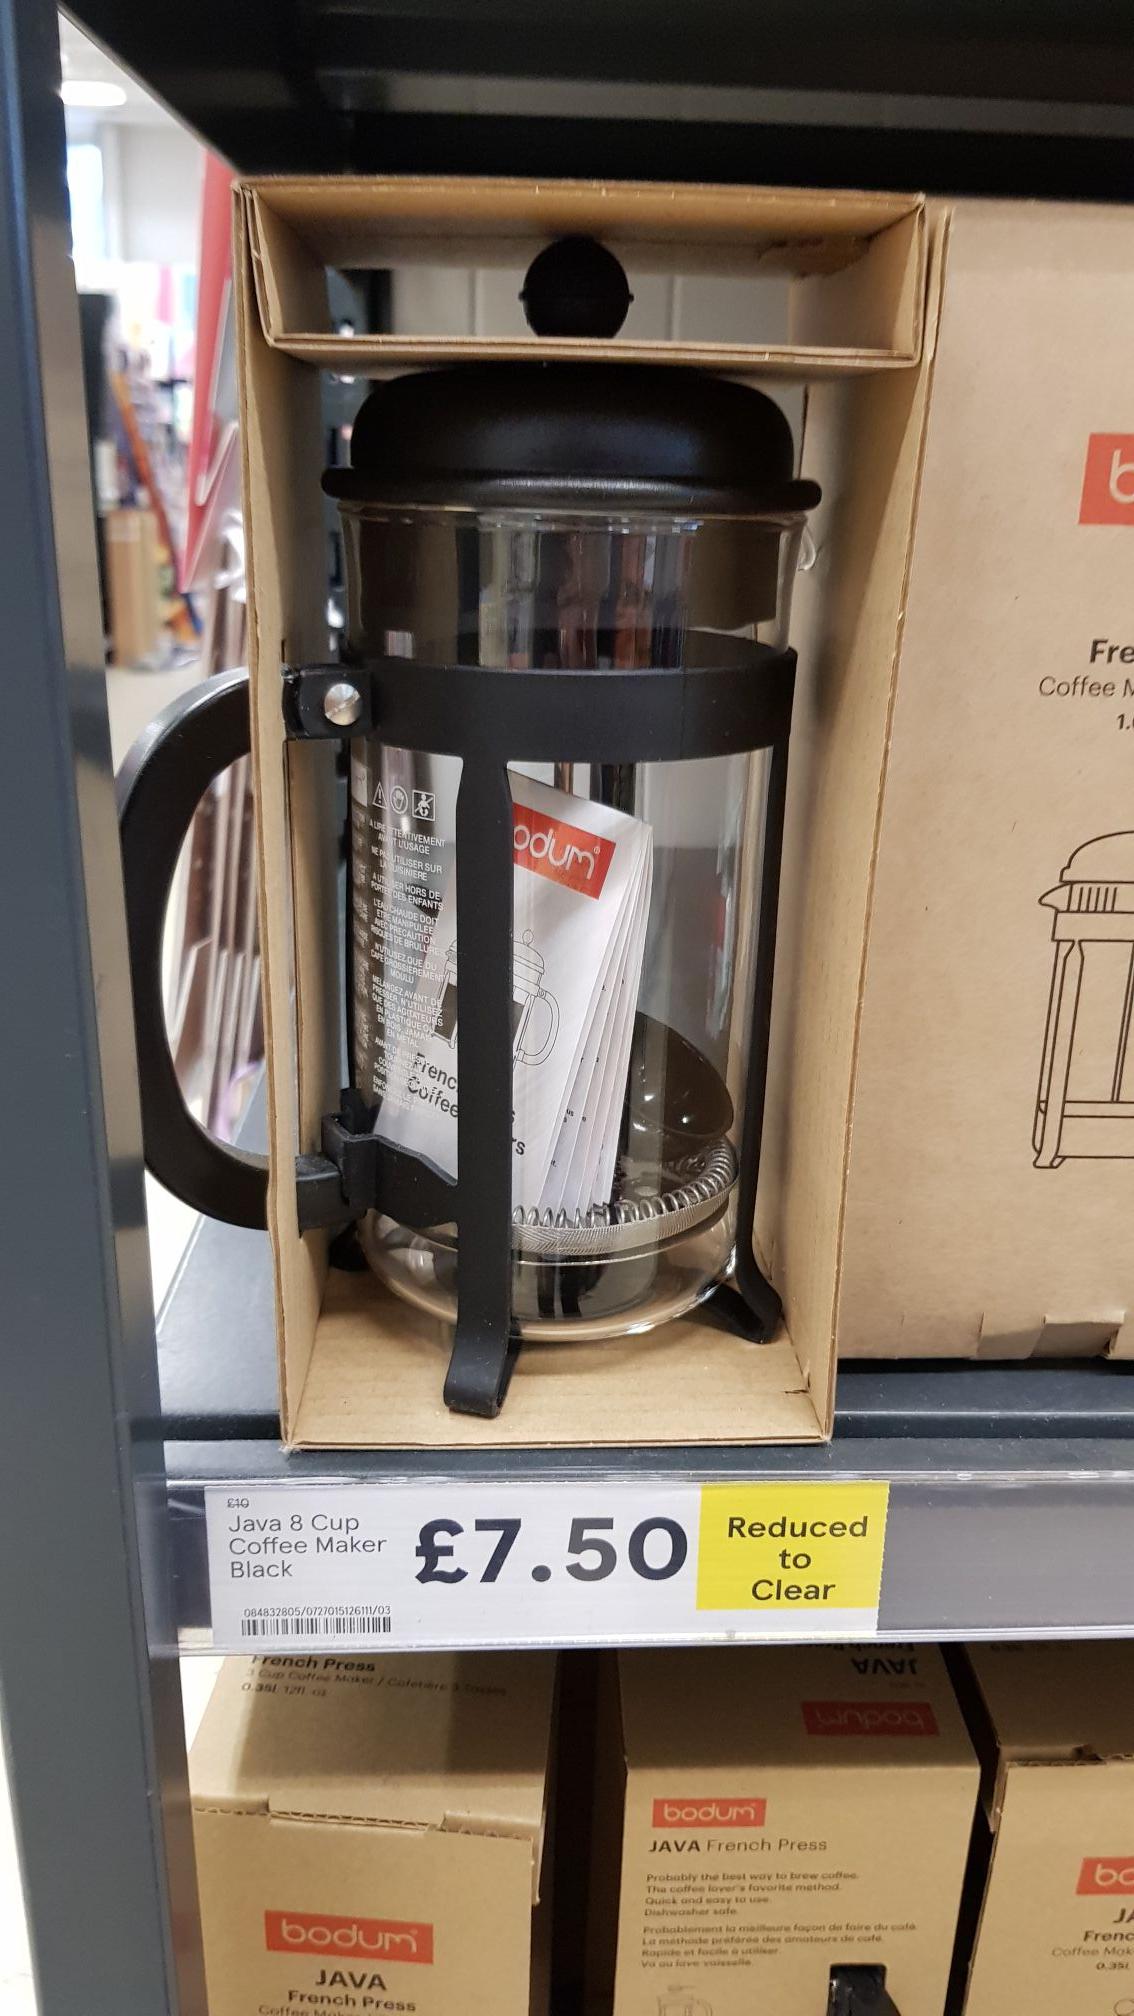 Bodum 8 cup 1L French Press £7.50 @ Tesco Cradley